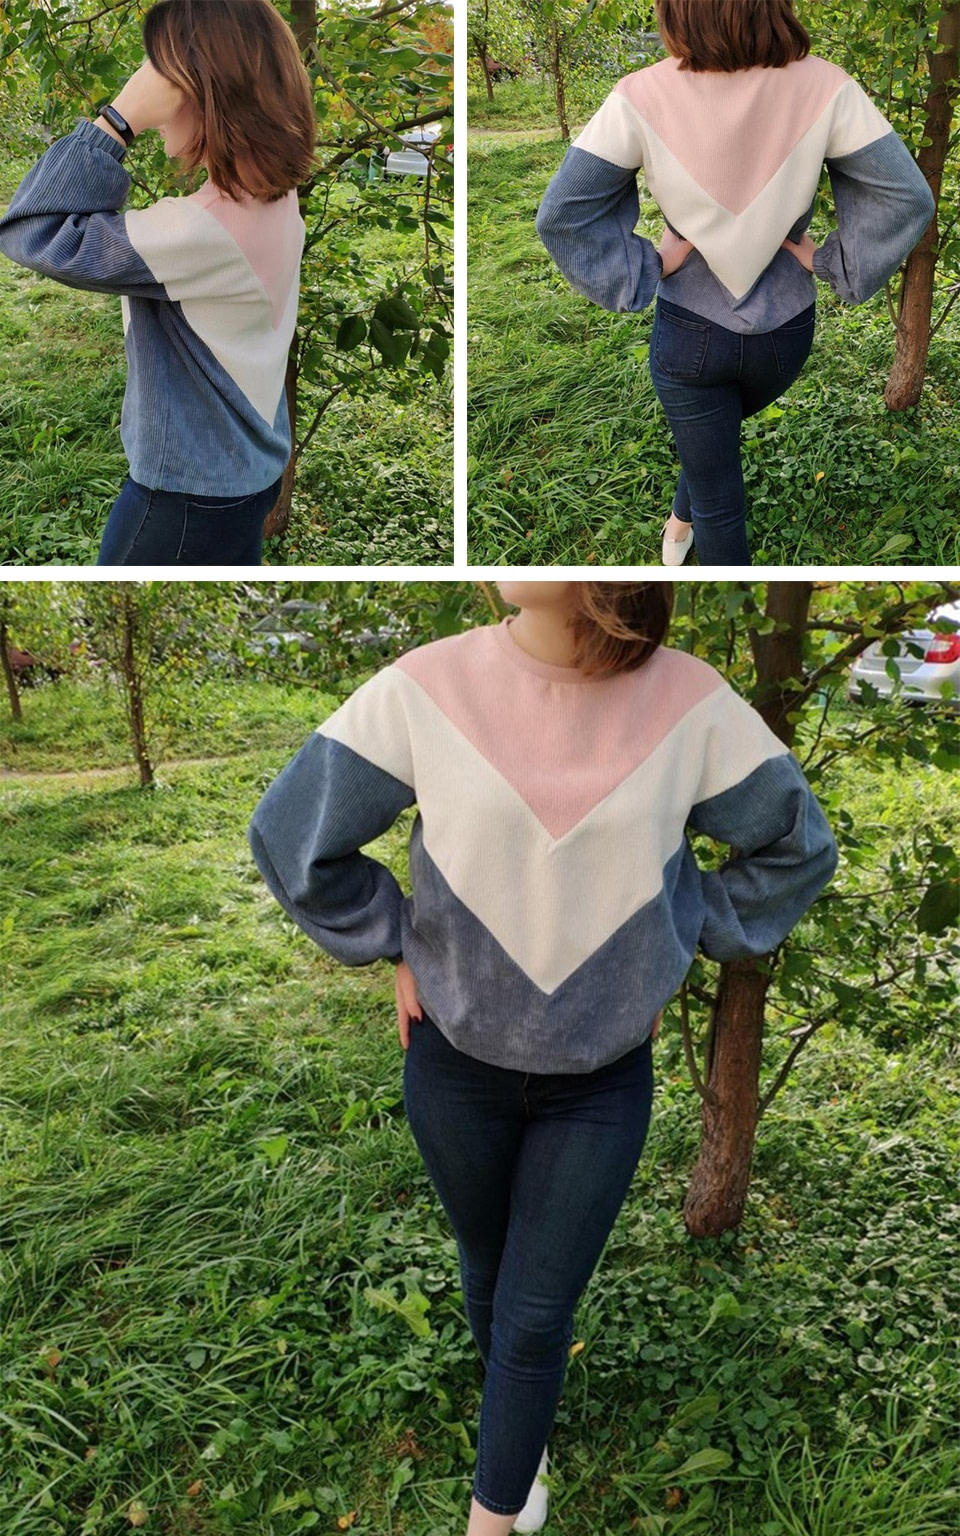 New Multi-color Cut and Sew Chevron Sweatshirt, Preppy Round Neck, Bishop Sleeve Pullover, Women's Sweatshirt 5